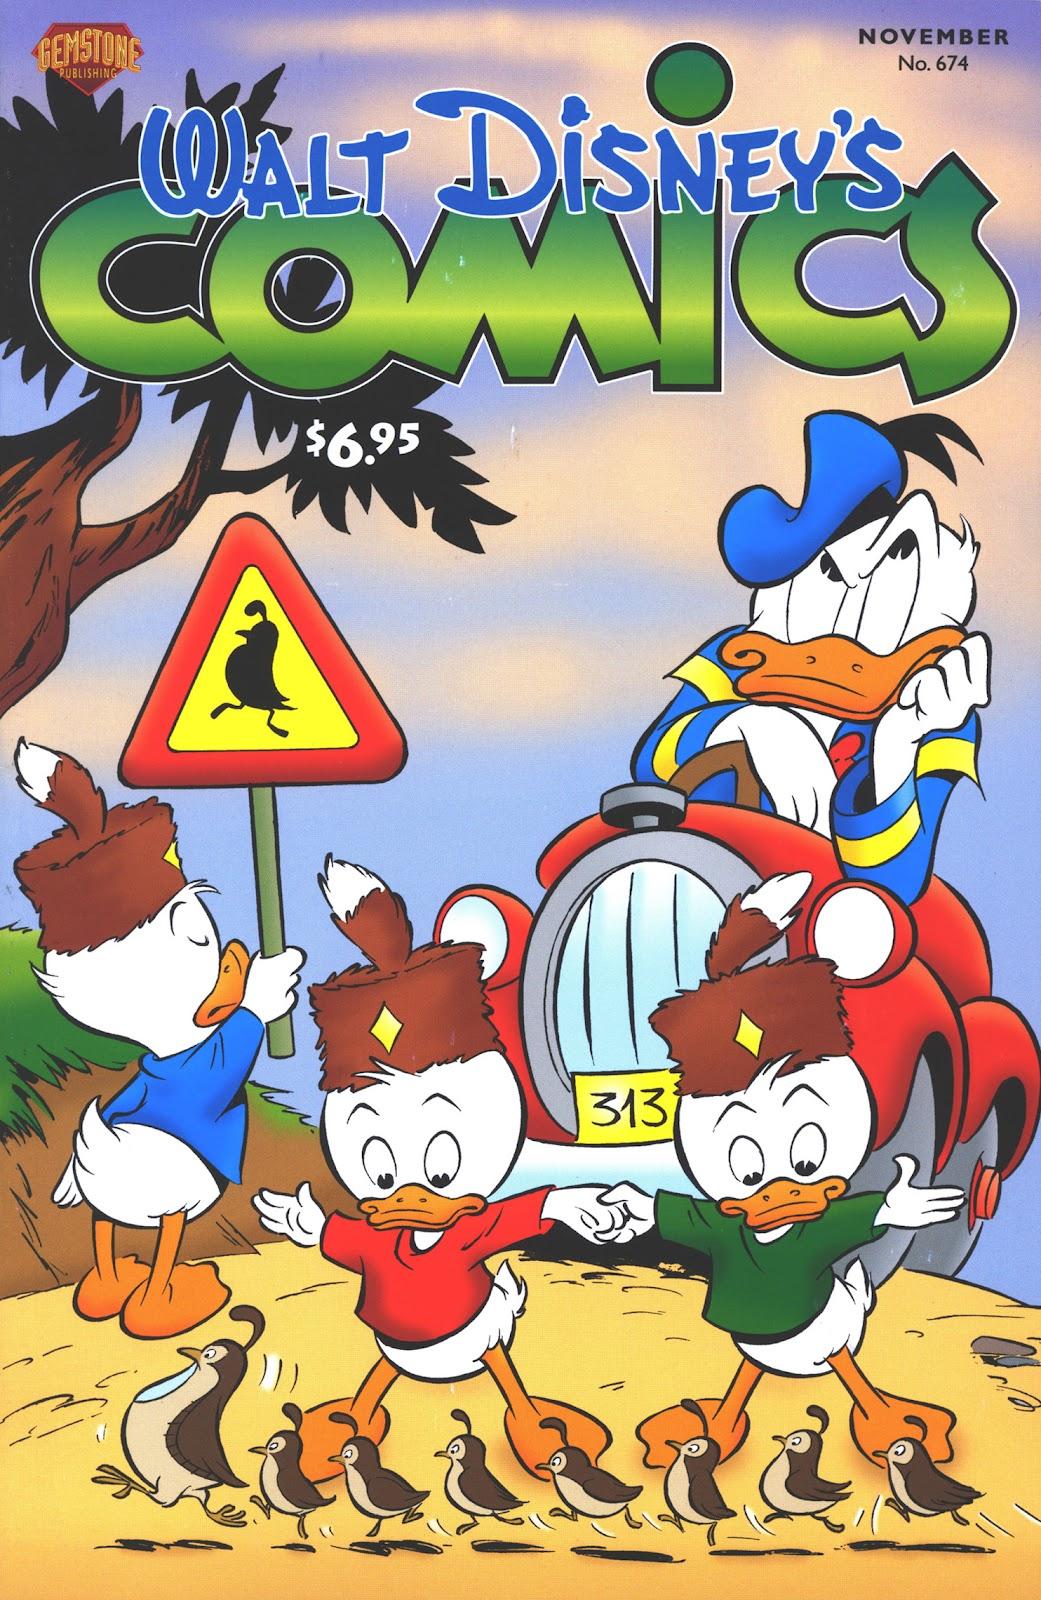 Walt Disneys Comics and Stories 674 Page 1